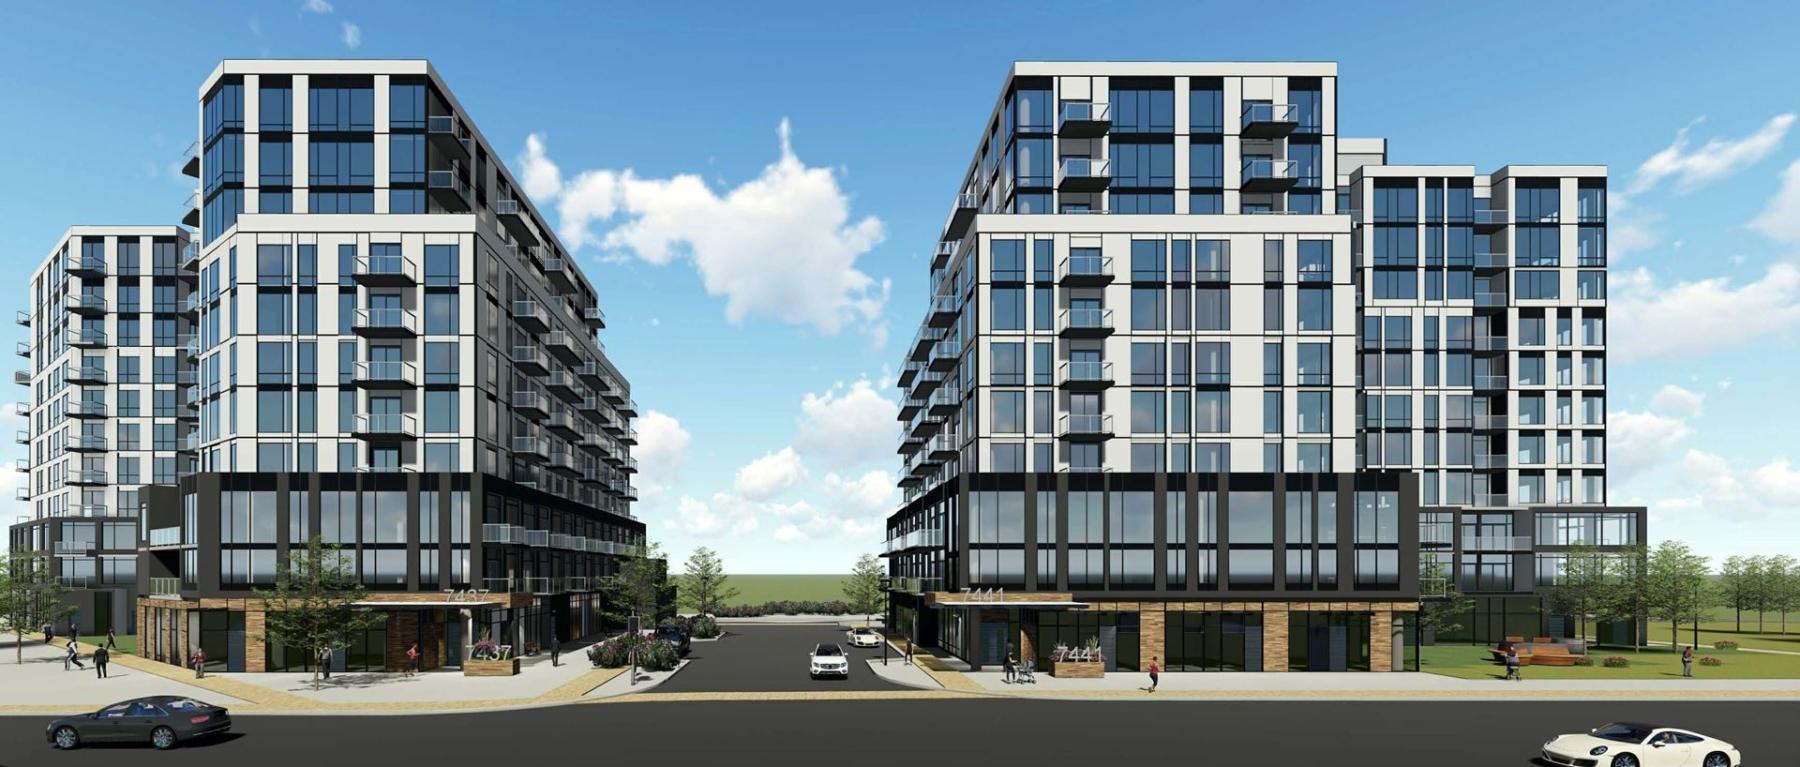 Exterior rendering of 7437 Kingston Road Condos in Toronto